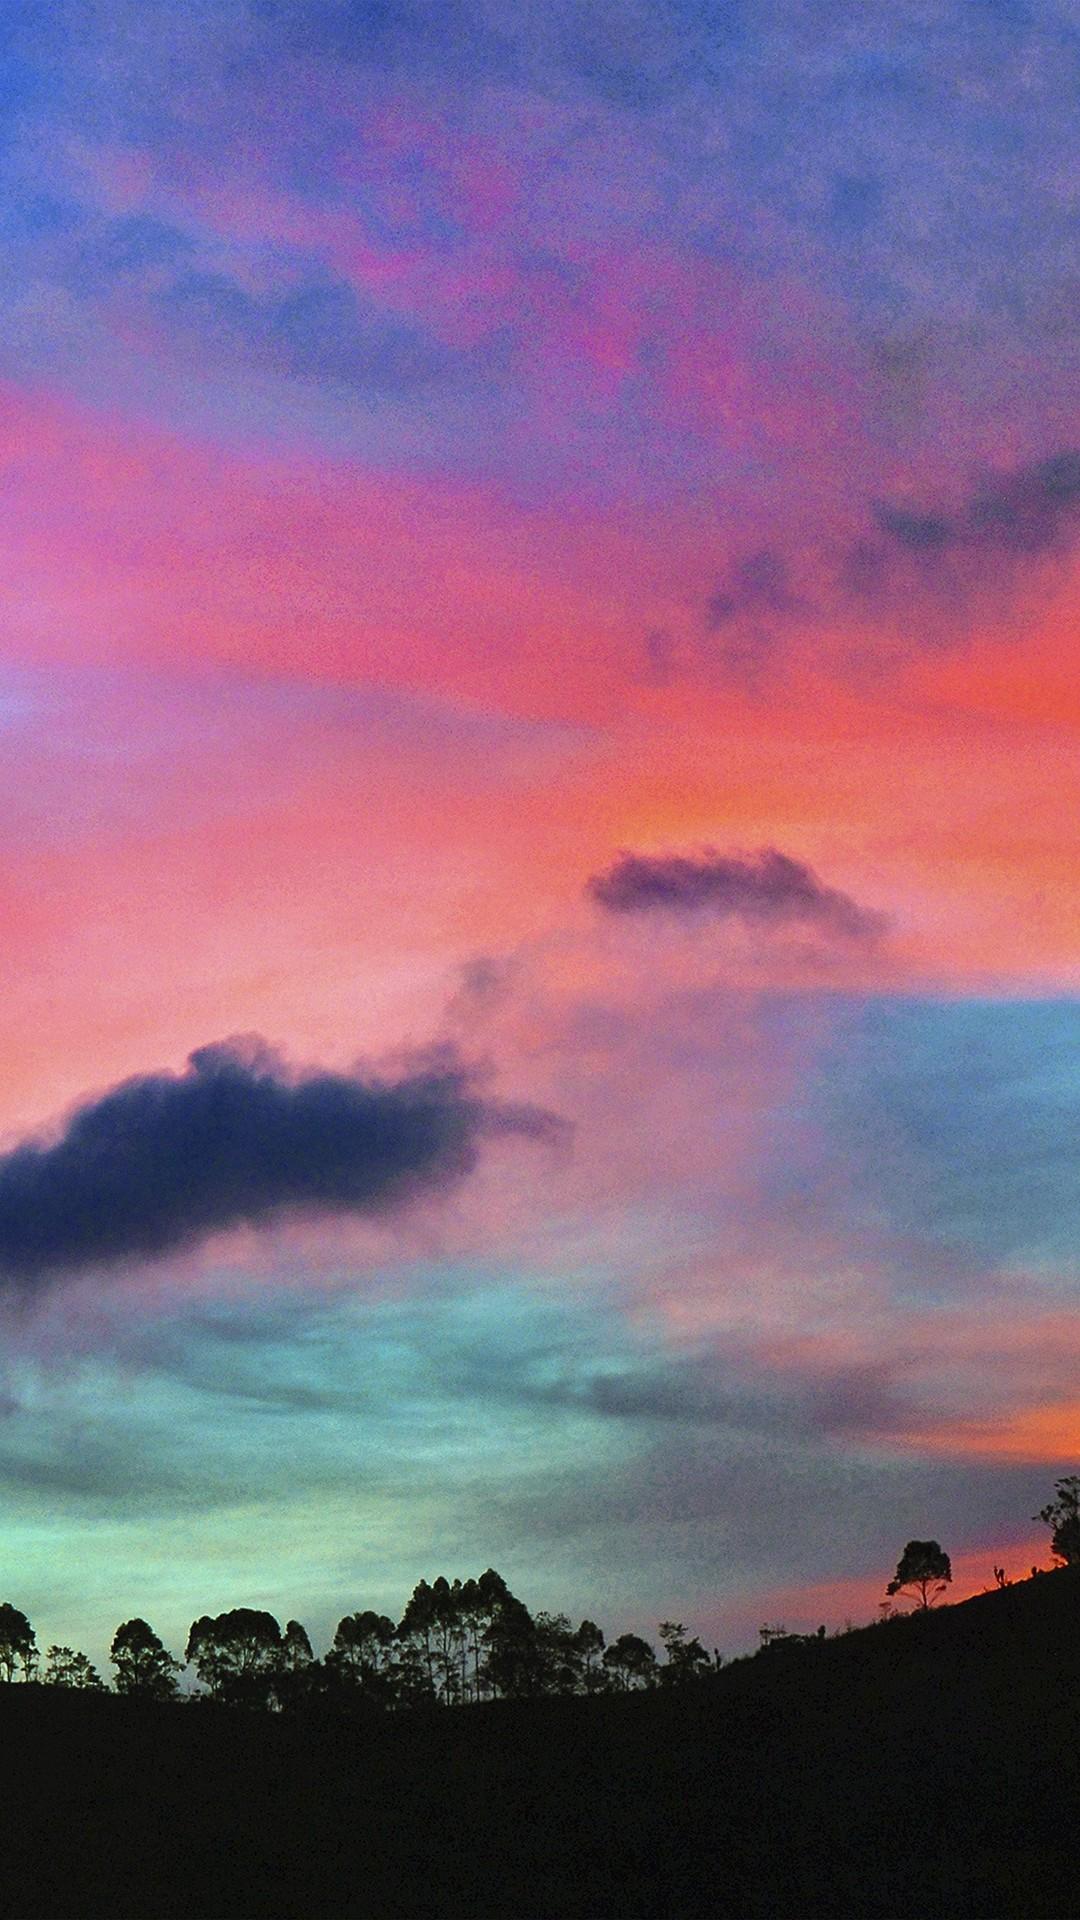 Sky Rainbow Cloud Sunset Nature iPhone 6 wallpaper